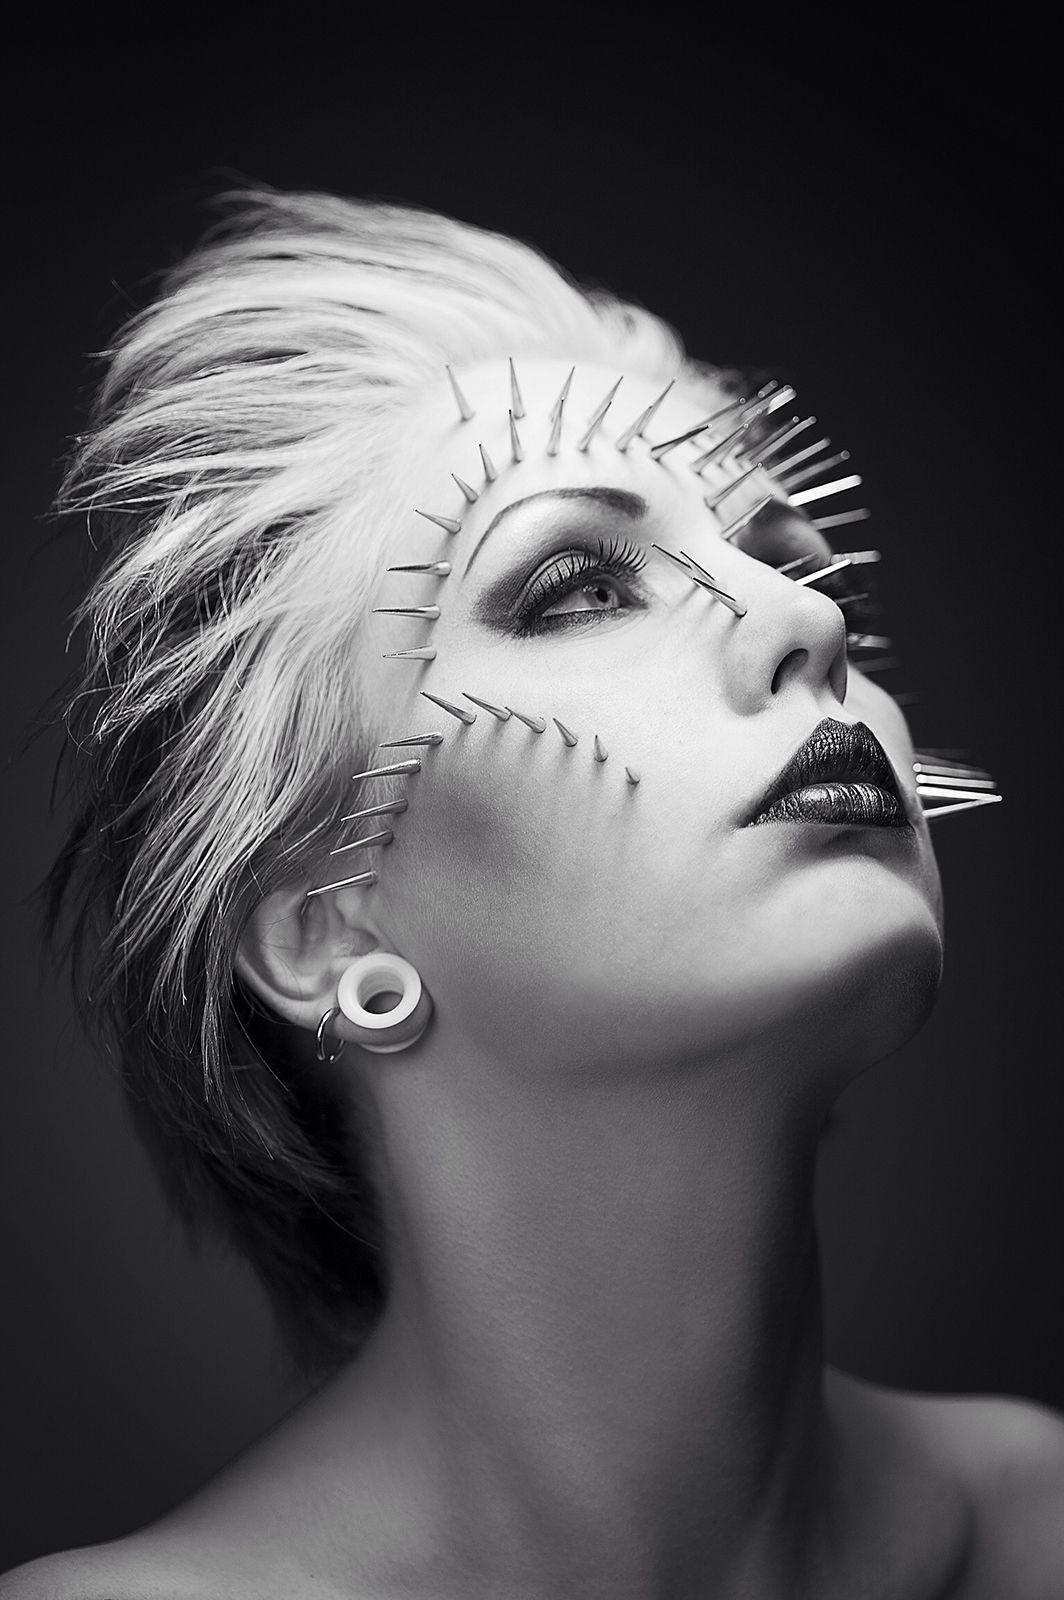 , Photographer/Stylist/Hair/Makeup: TwistedPix Model: Charlie Baker, Hot Models Blog 2020, Hot Models Blog 2020